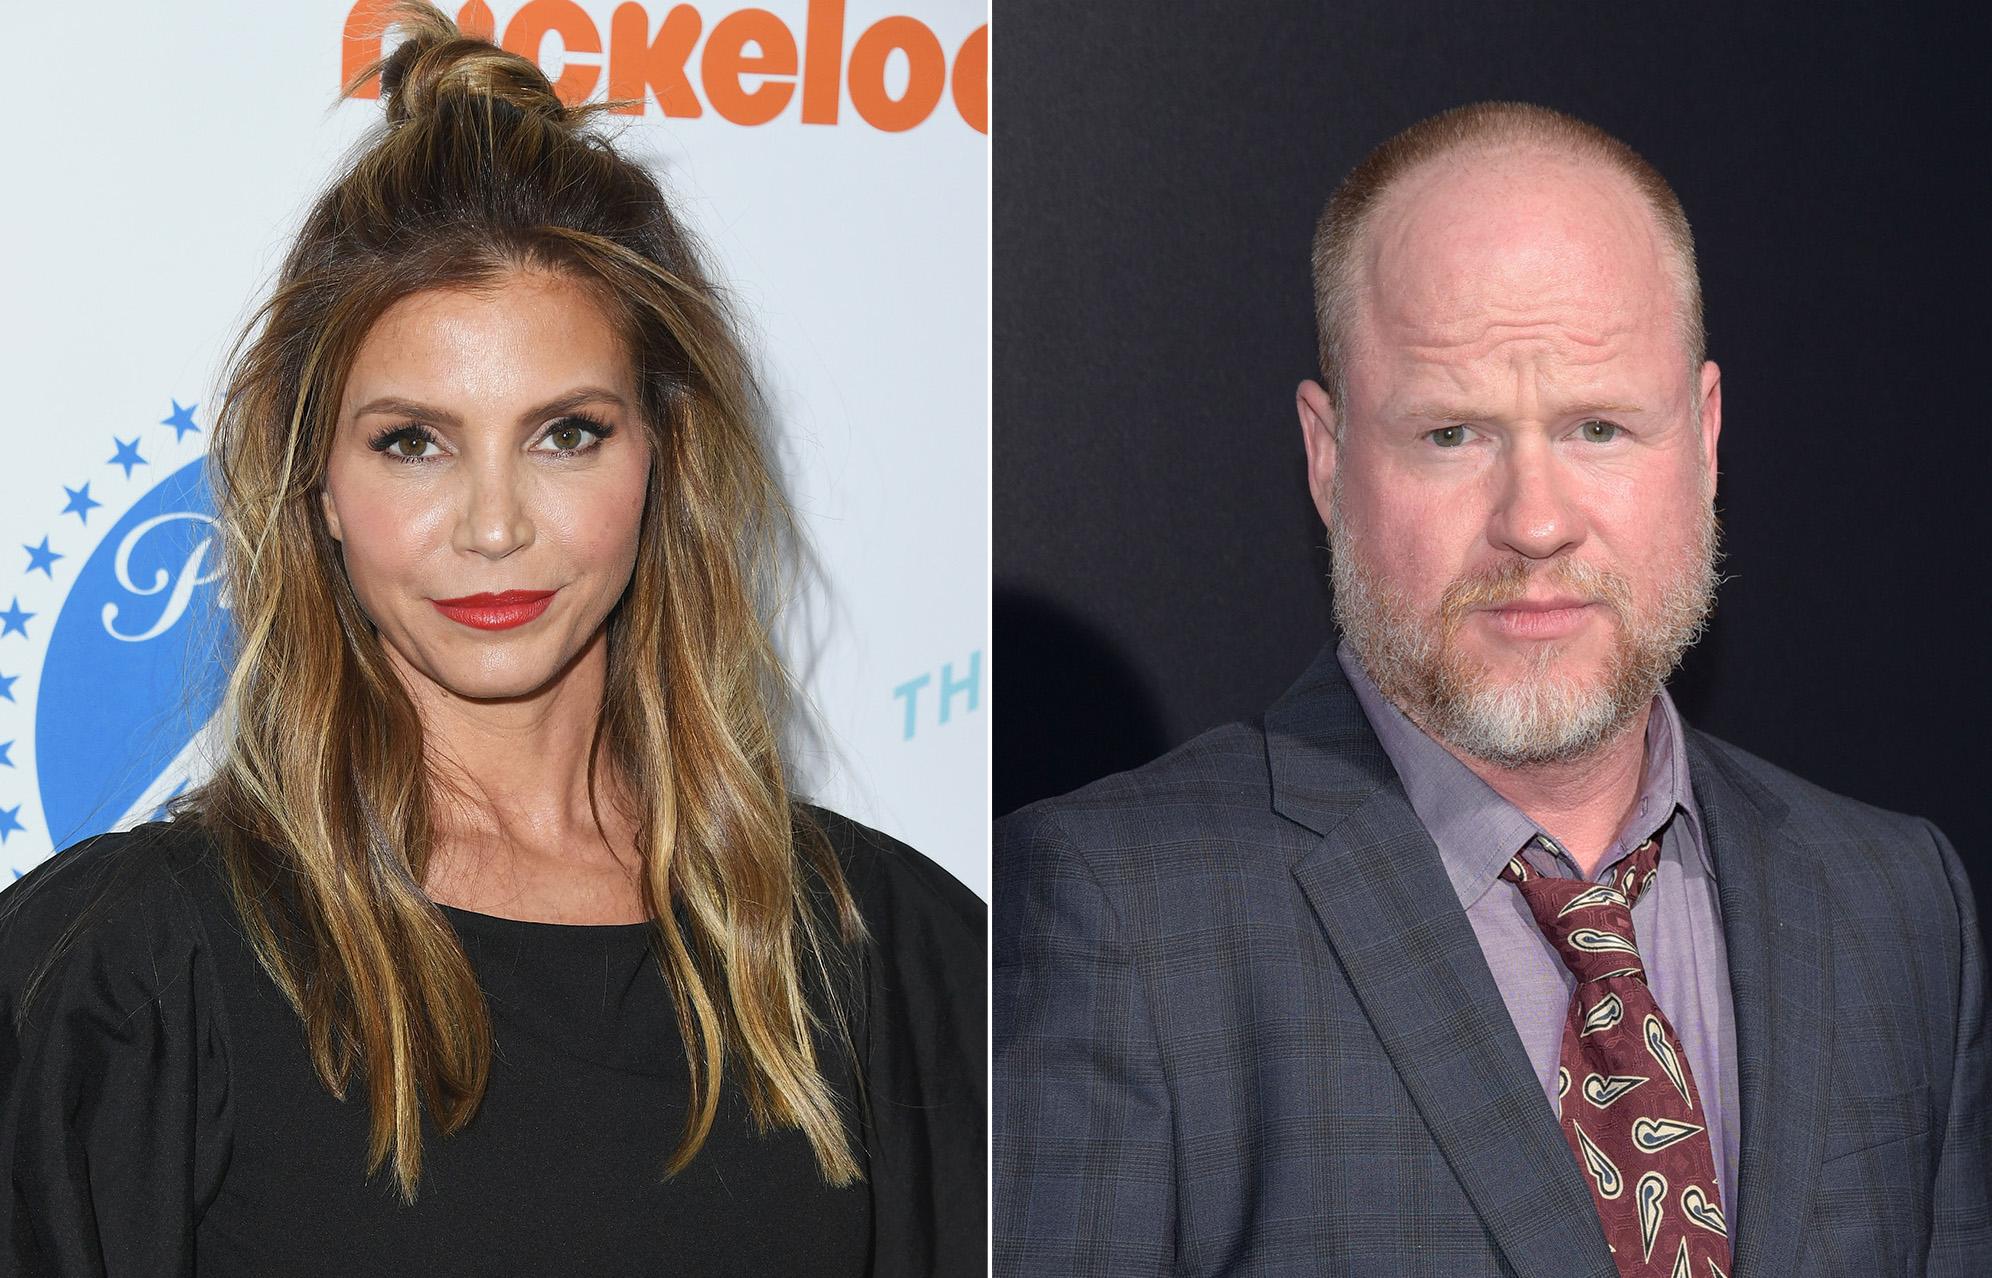 Charisma Carpenter and Joss Whedon